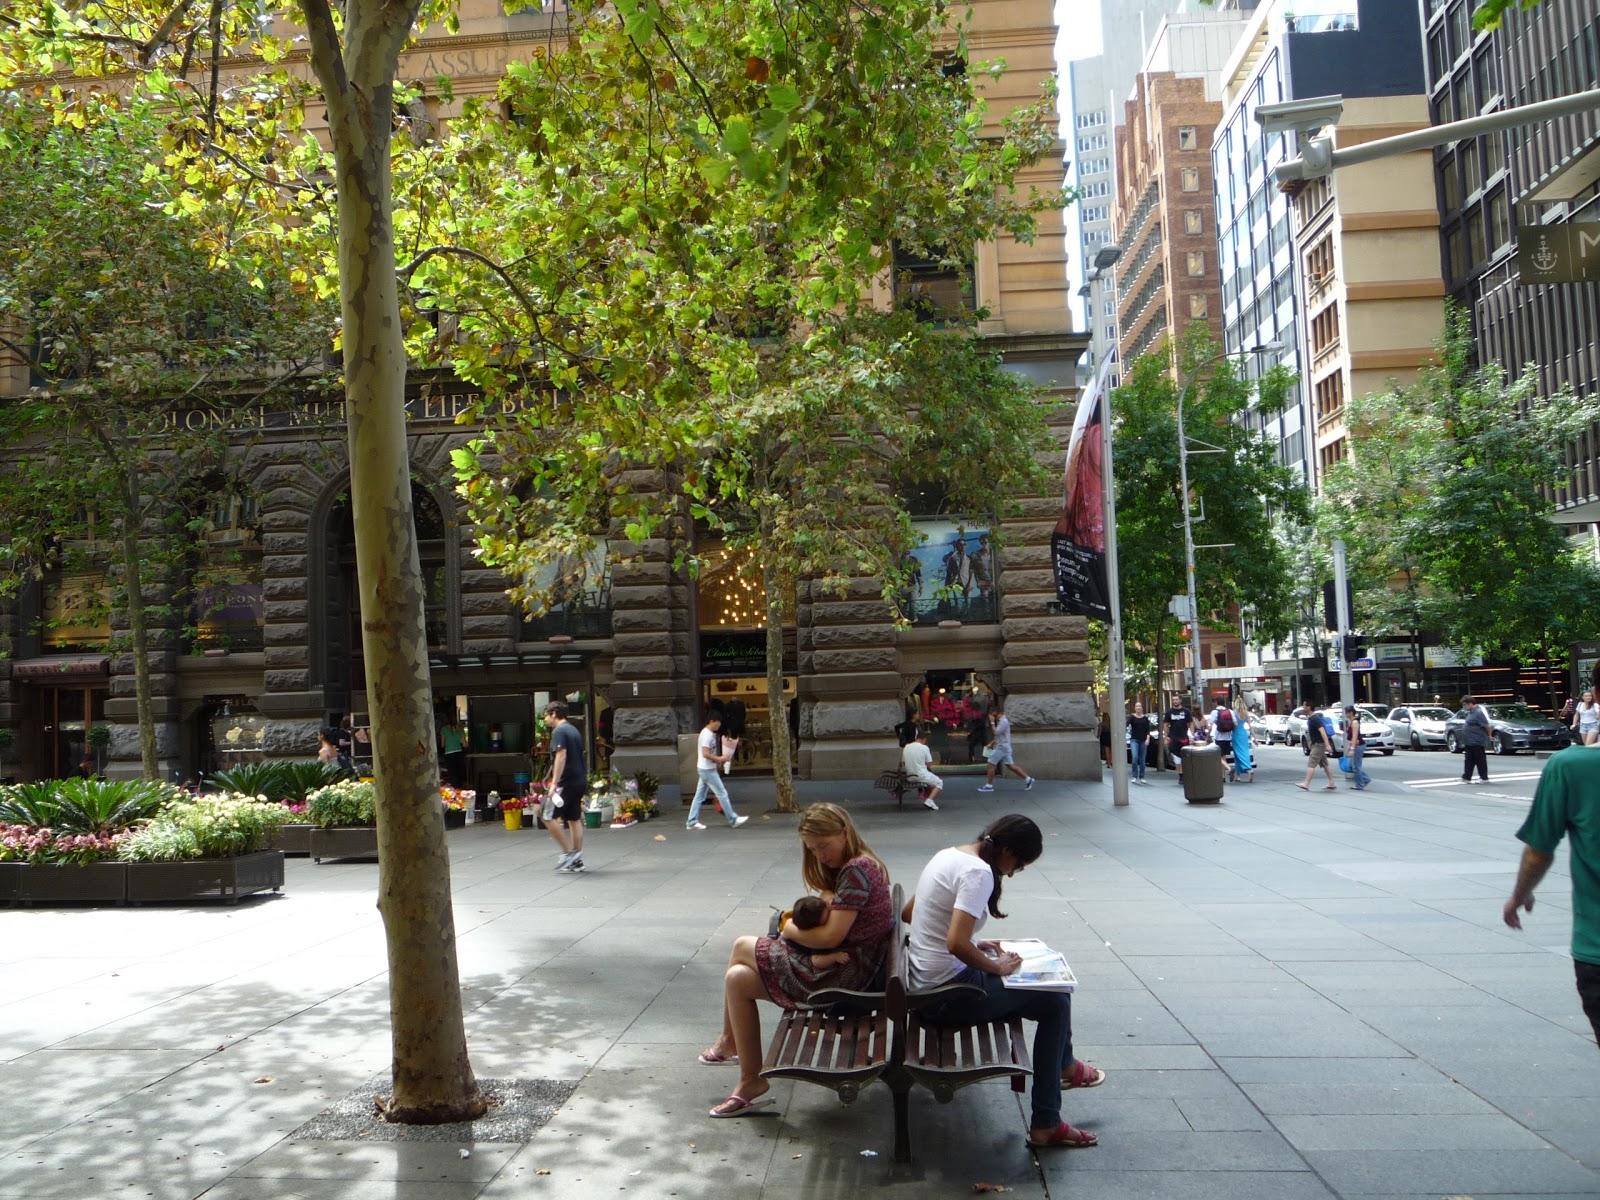 Julia 39 S Journal Of City Design Martin Place Visit